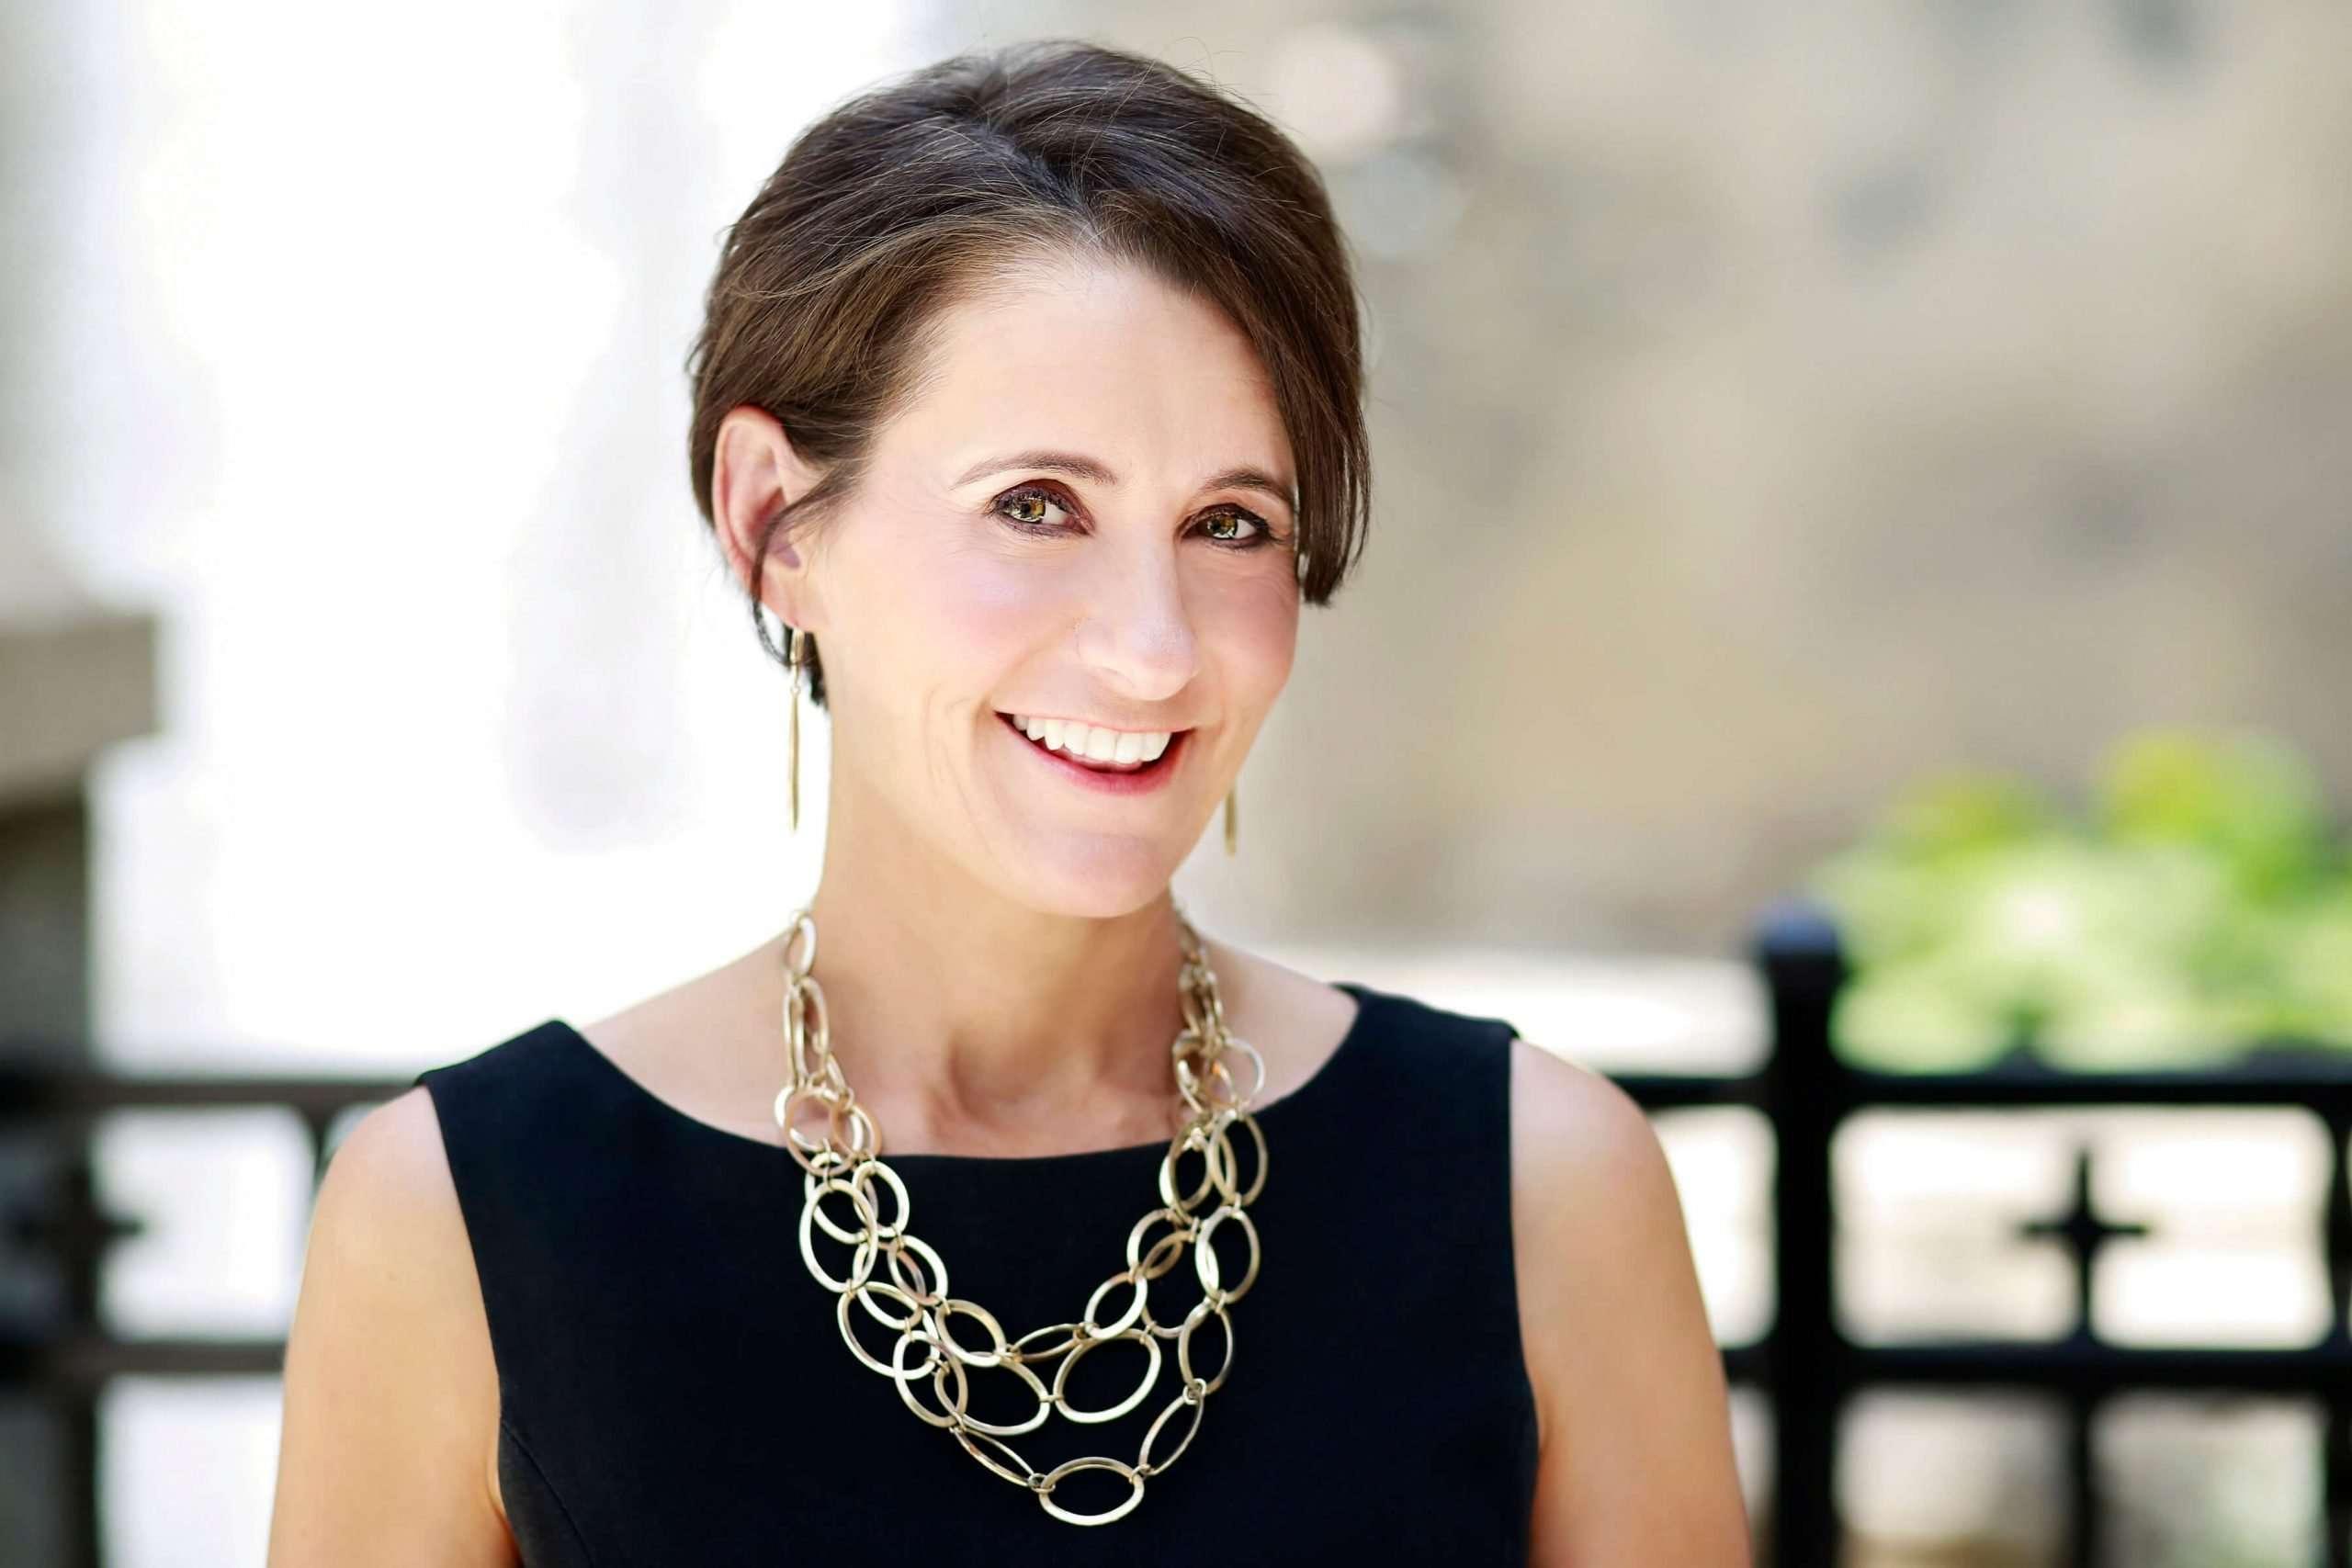 Michelle Bridger